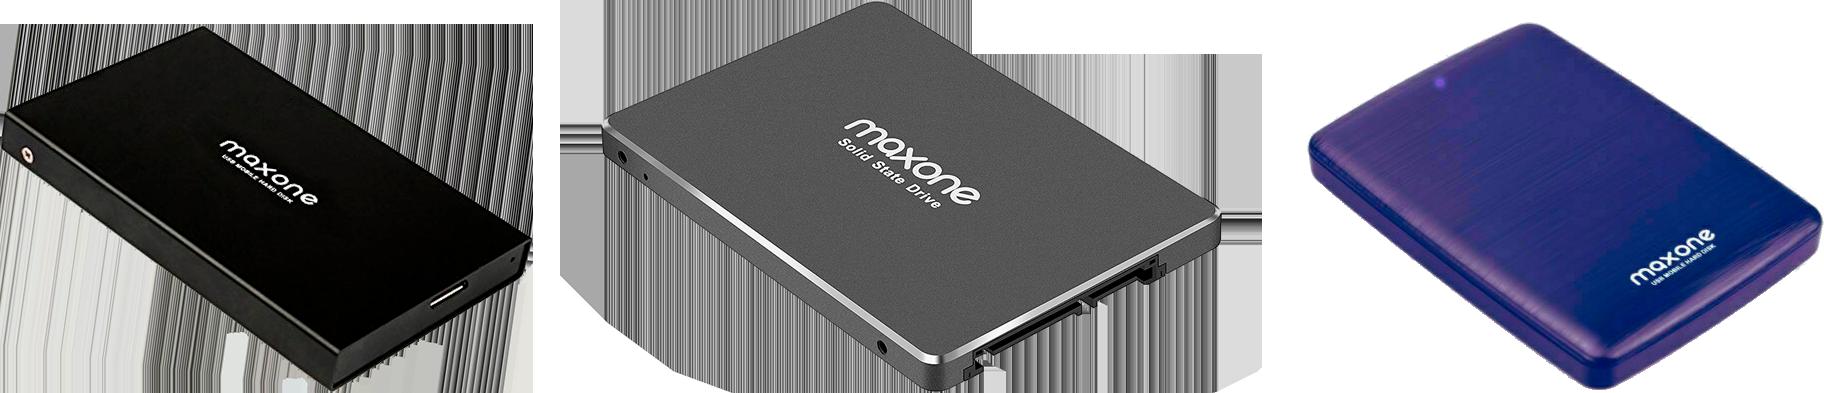 Maxone Data Recovery